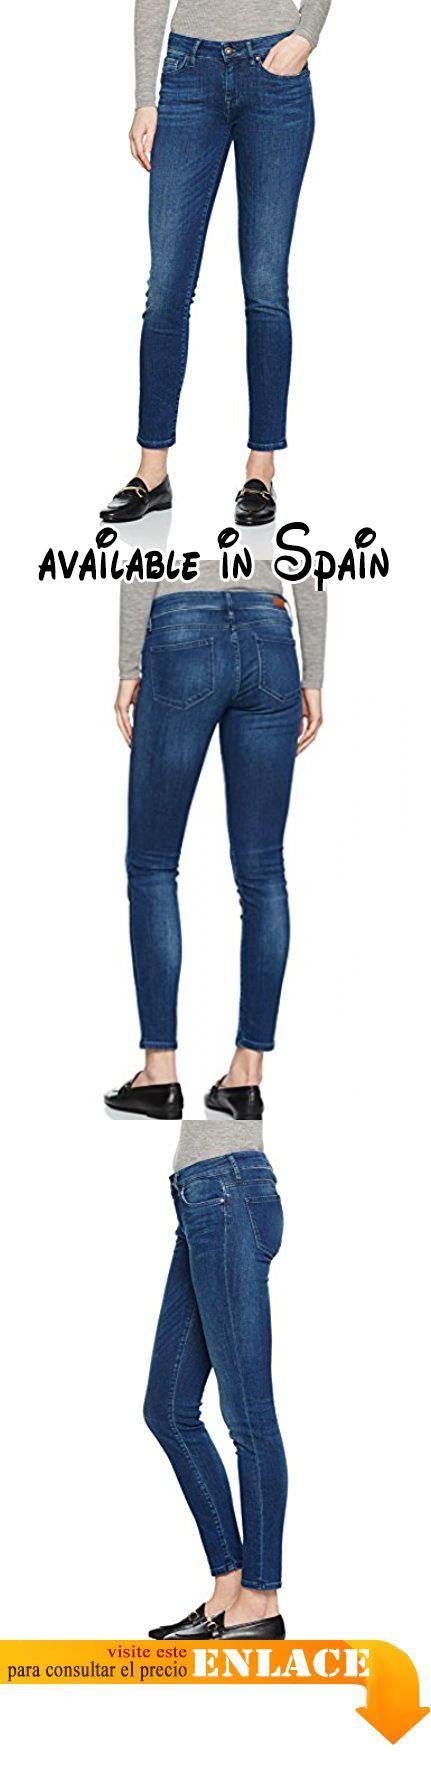 B01MYTY98E : Tommy Hilfiger Venice LW Pantalón para Mujer Multicolor (Mary) Talla única (Talla del fabricante: 3234).